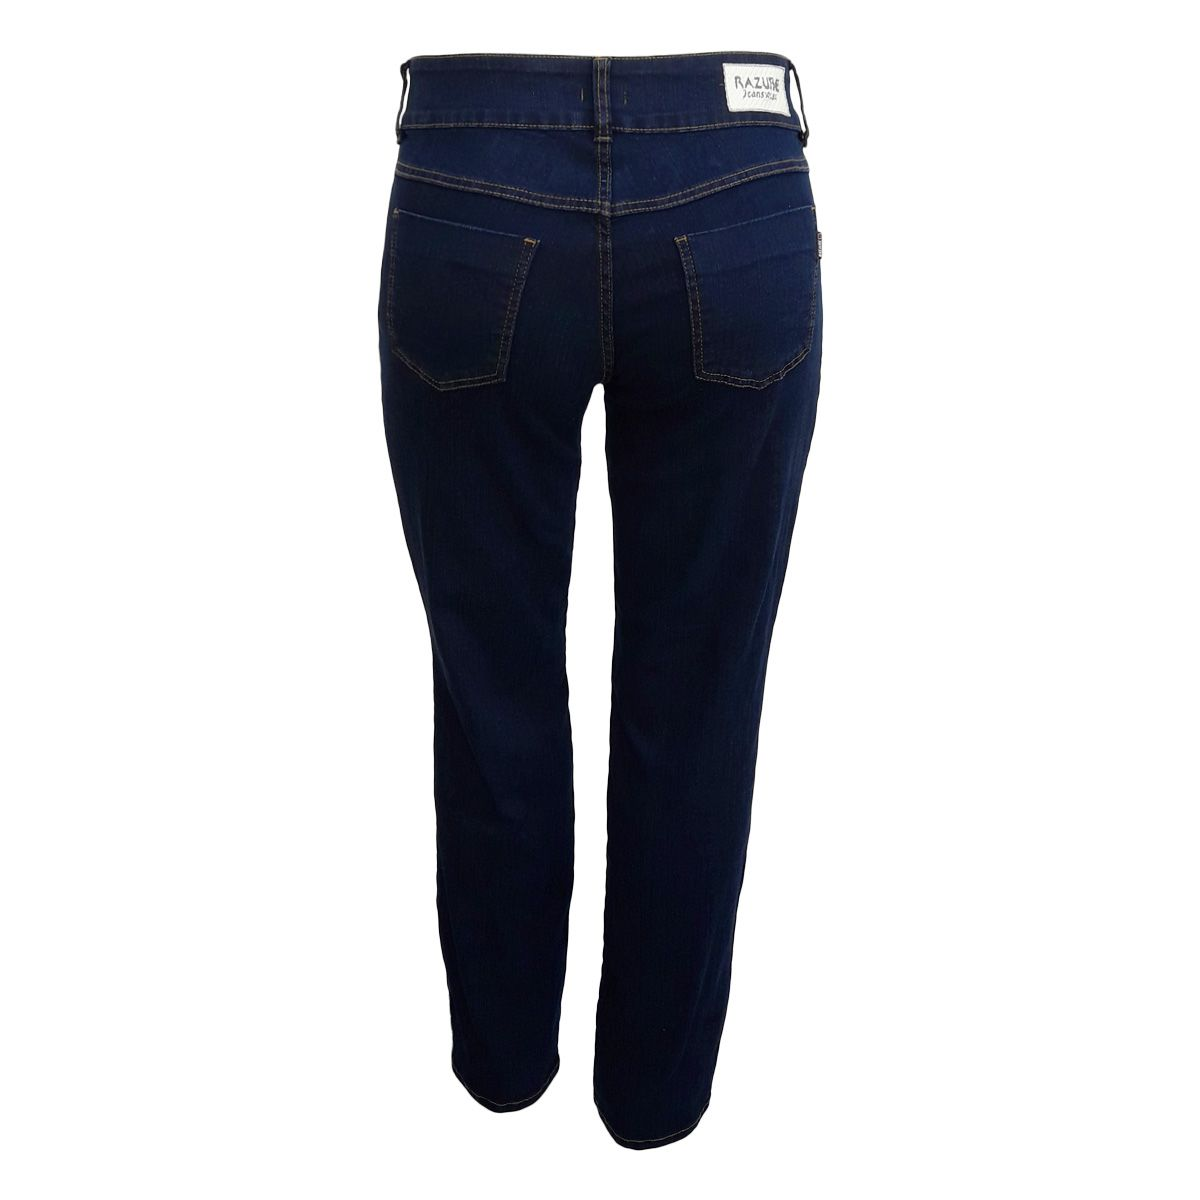 Calça Jeans Feminina Reta Plus Size